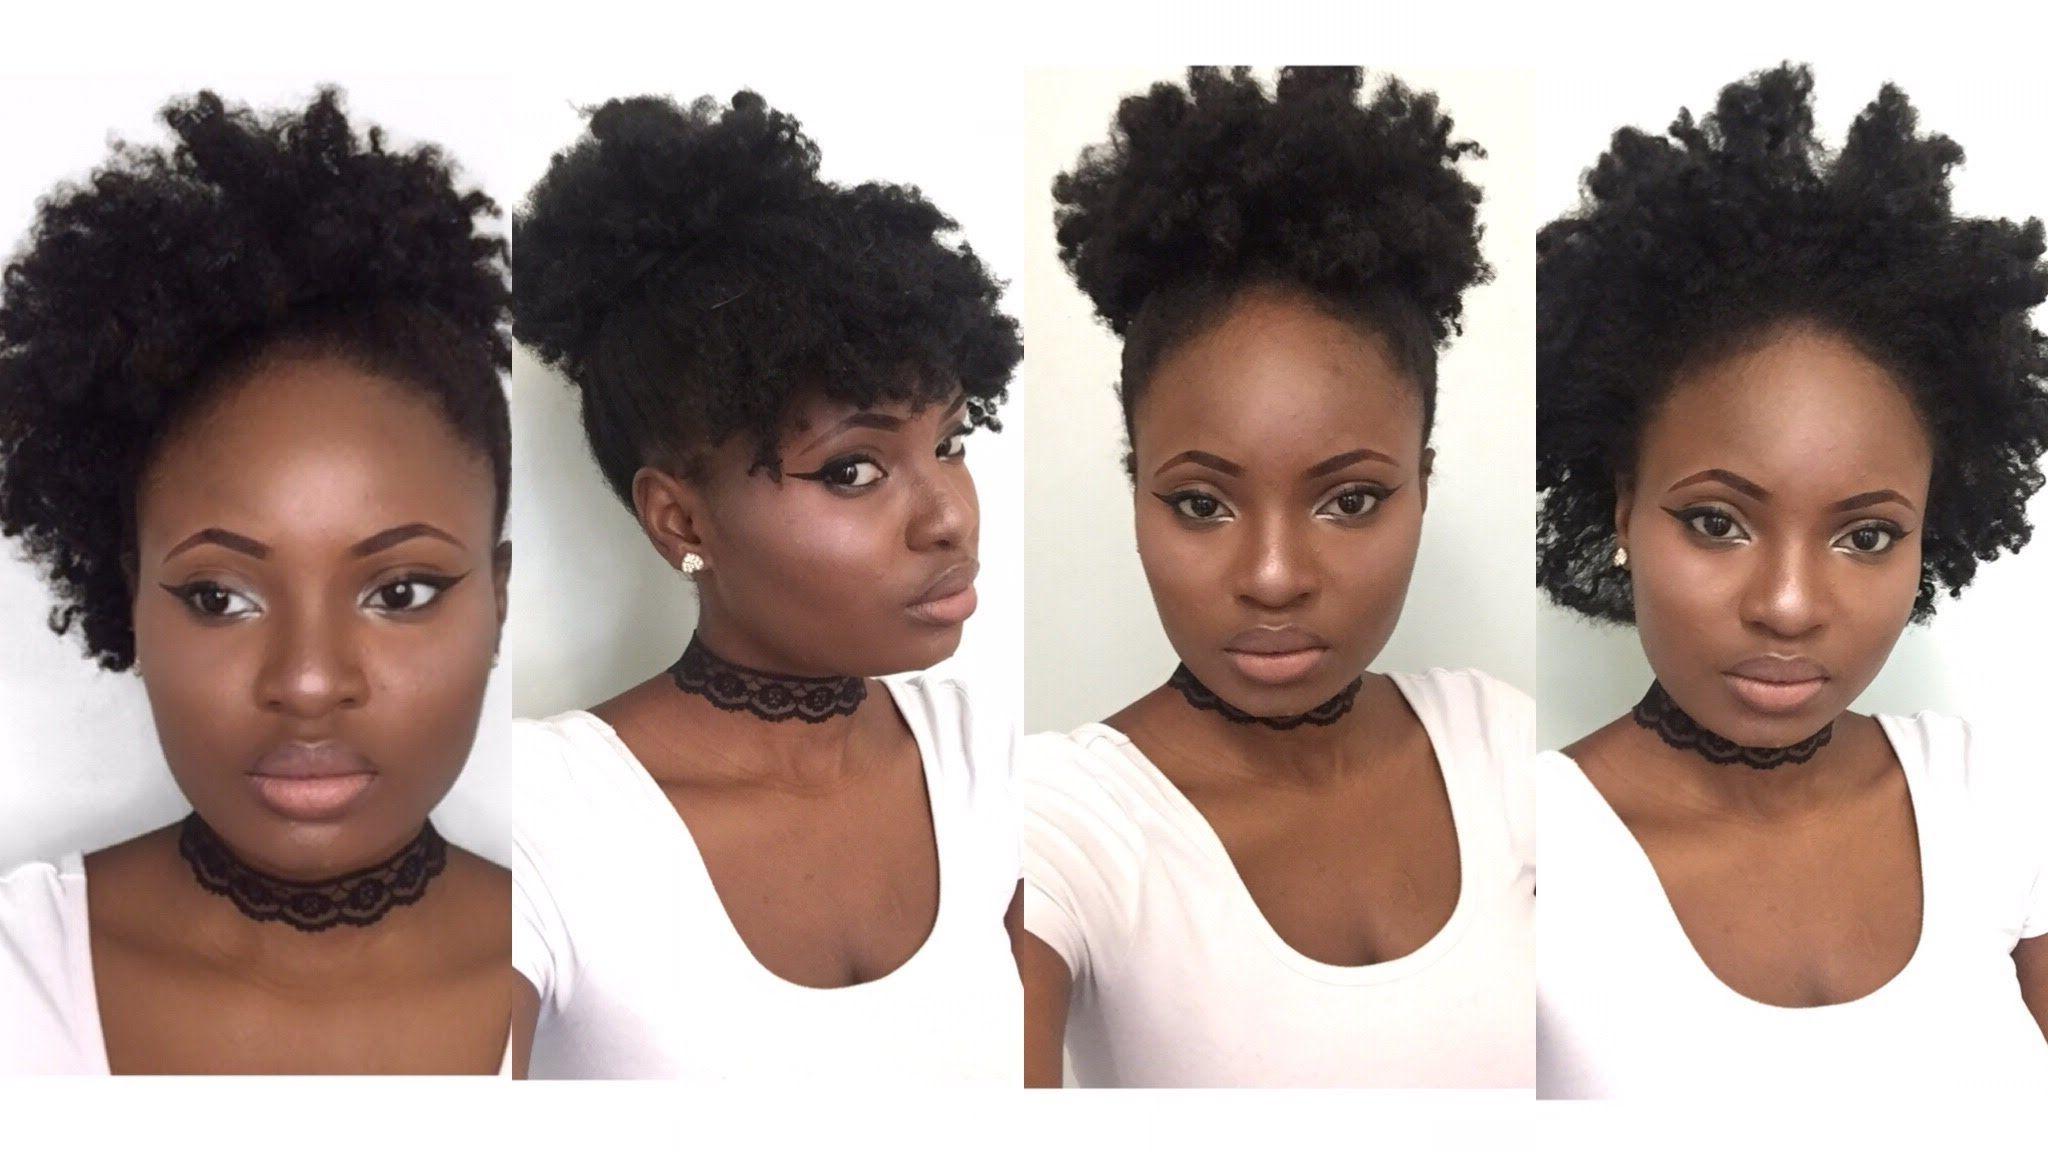 Fashionable Black Women Natural Medium Hairstyles Regarding 4 Simple Back To School Hairstyles For Medium Natural Hair (4C (Gallery 4 of 20)